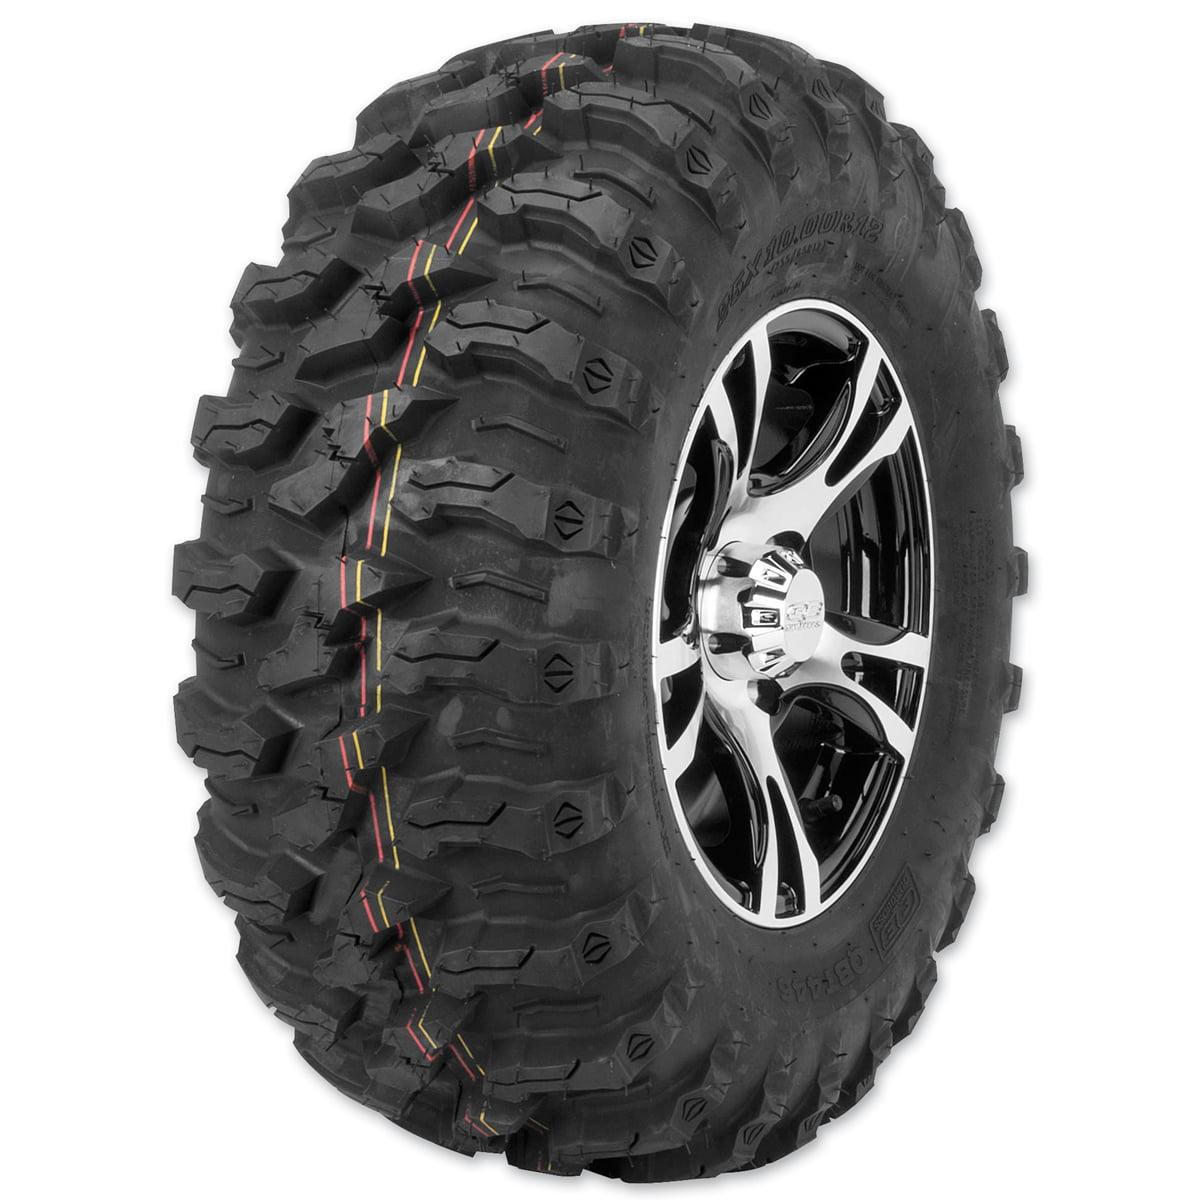 Quad Boss P3027-25X10-12 QBT446 Radial Utility Tires 25X10R12